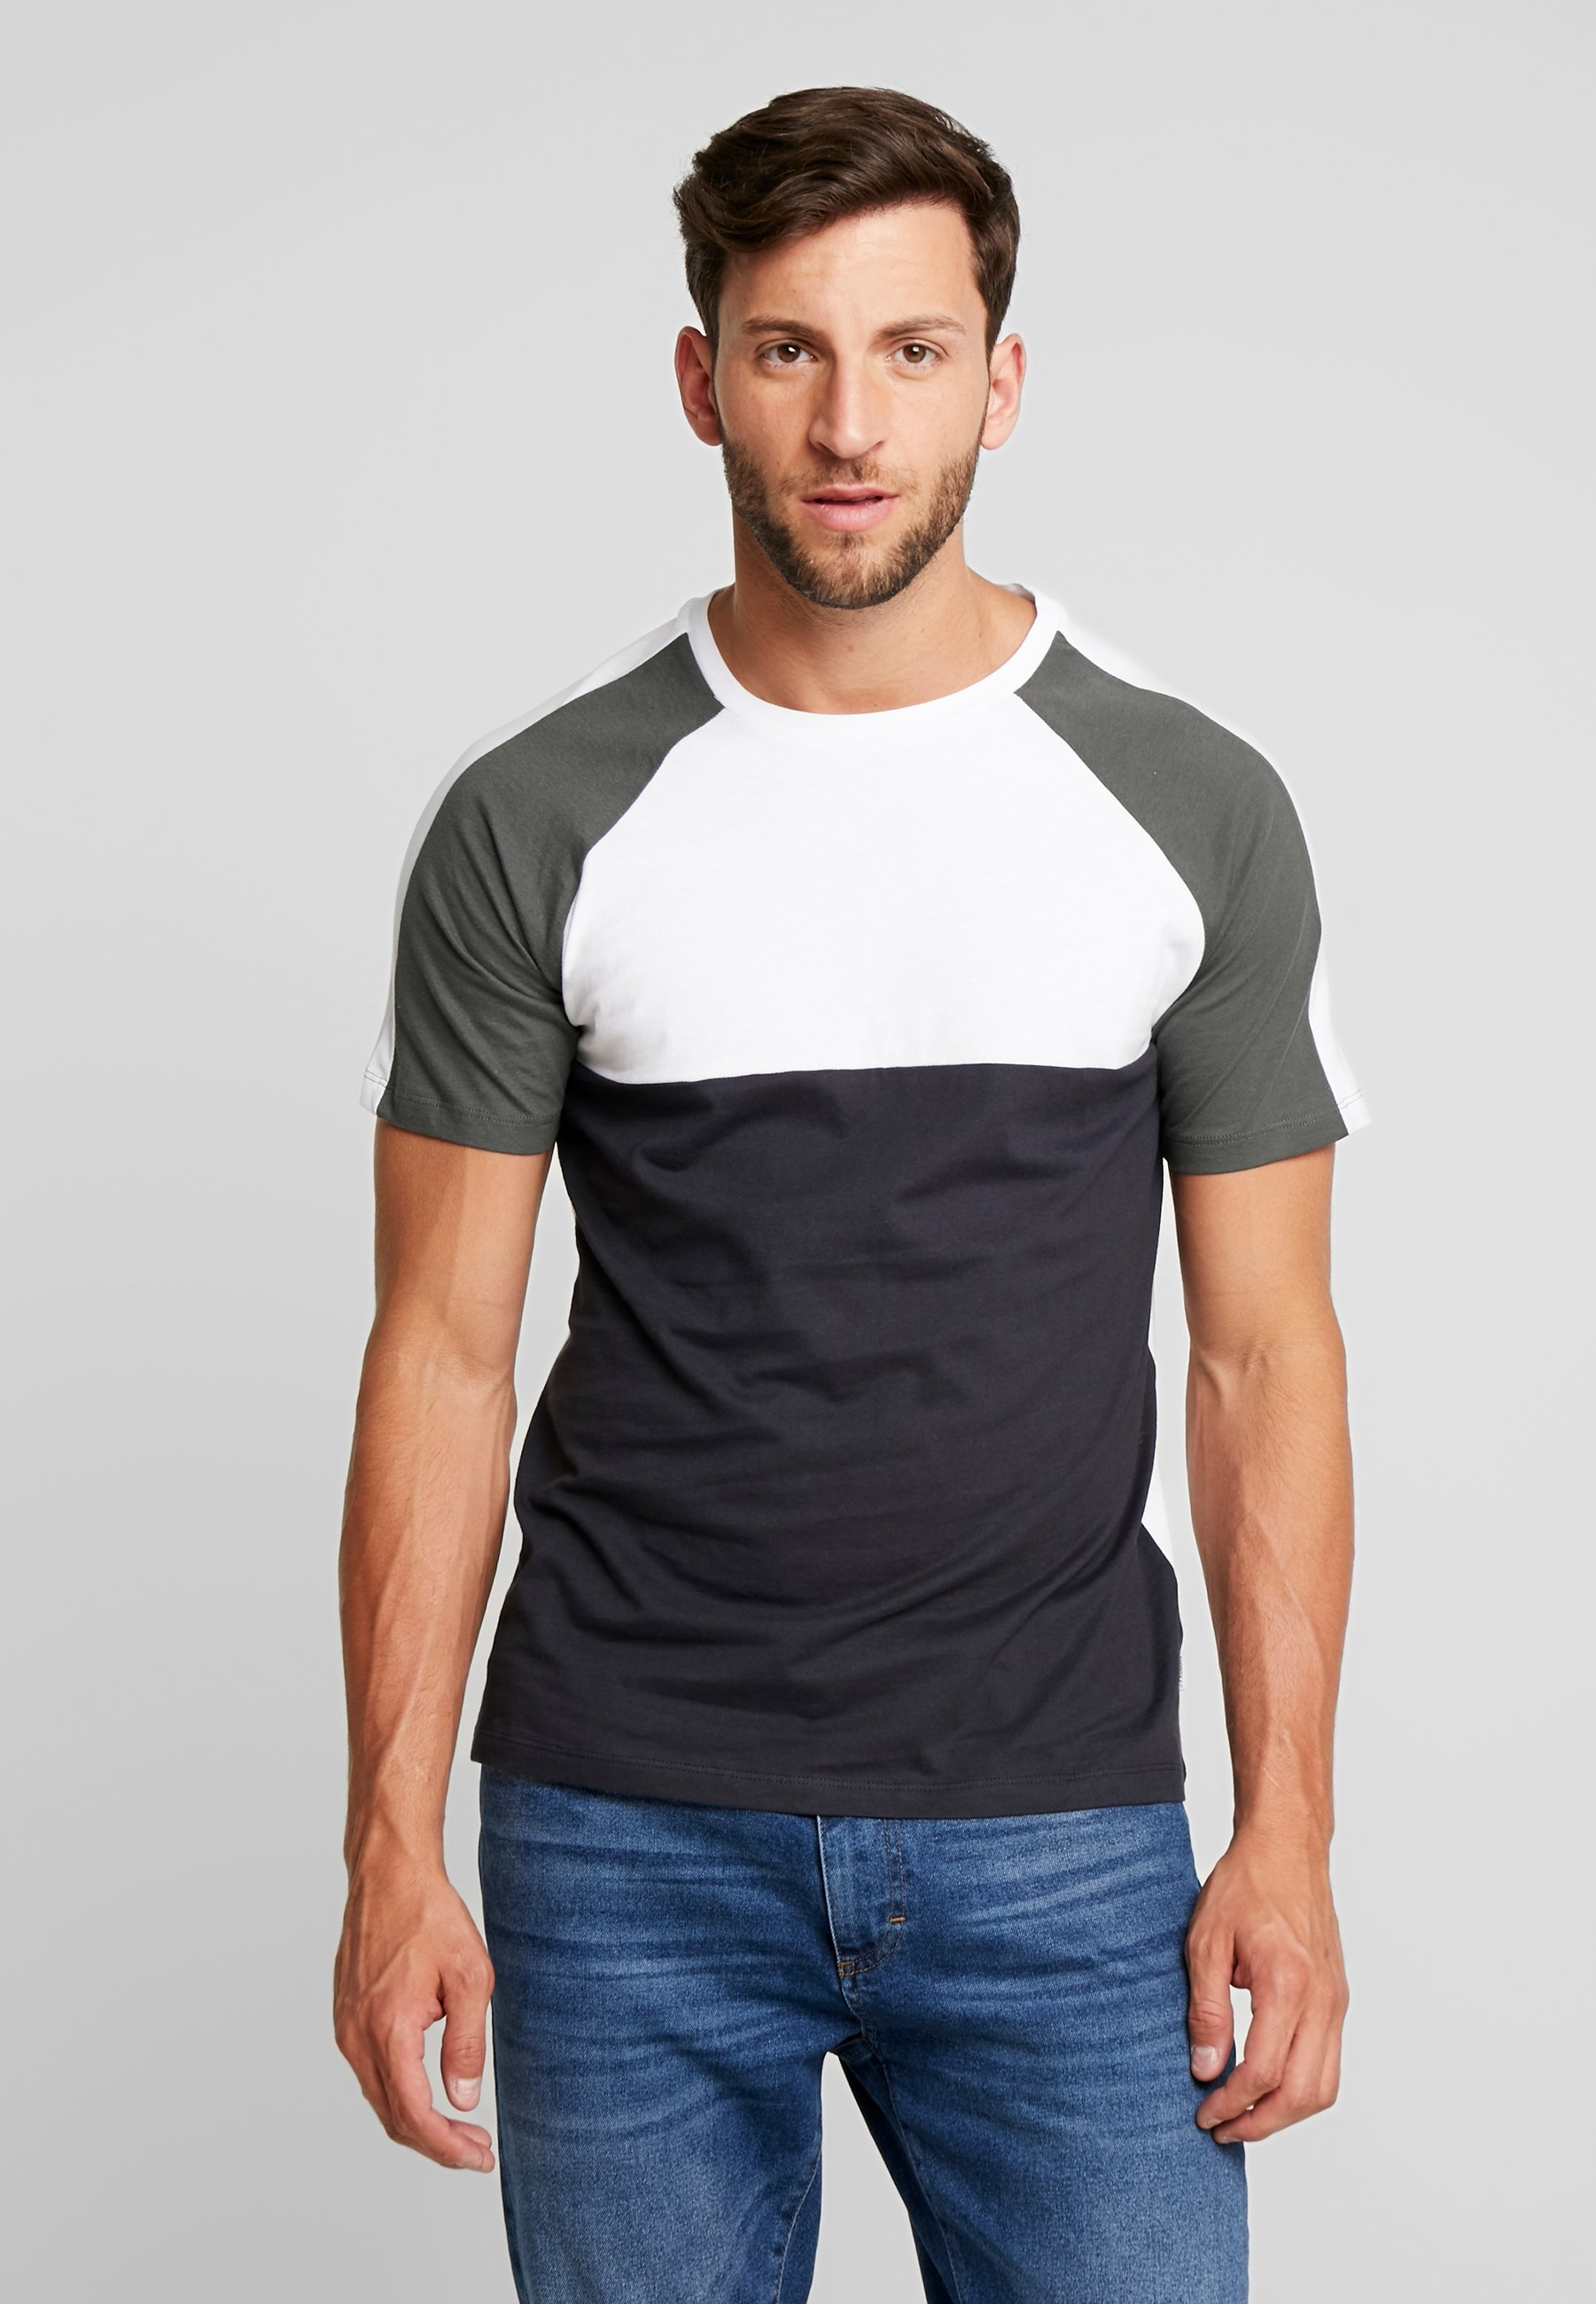 shirt Imprimé Produkt Pktviy Urban Chic TeeT Clay Cut tQrhdCBsxo